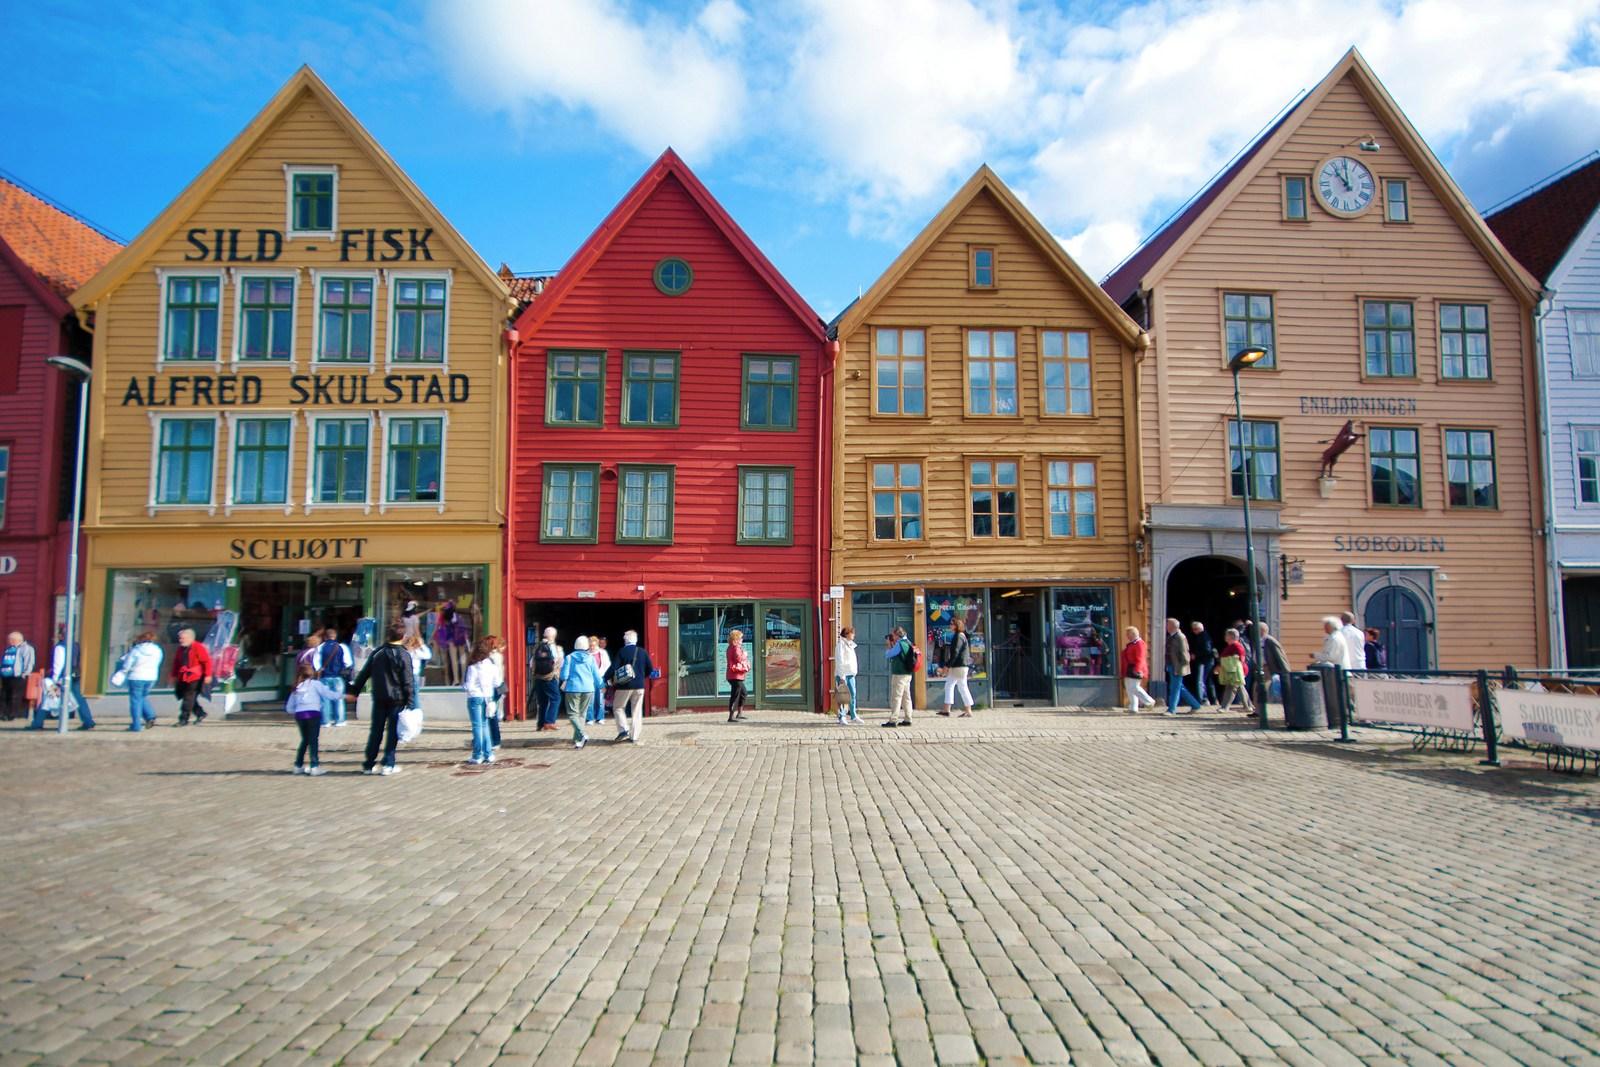 [Travel Gallery] 겨울왕국에 찾아든 여름, 노르웨이 베르겐